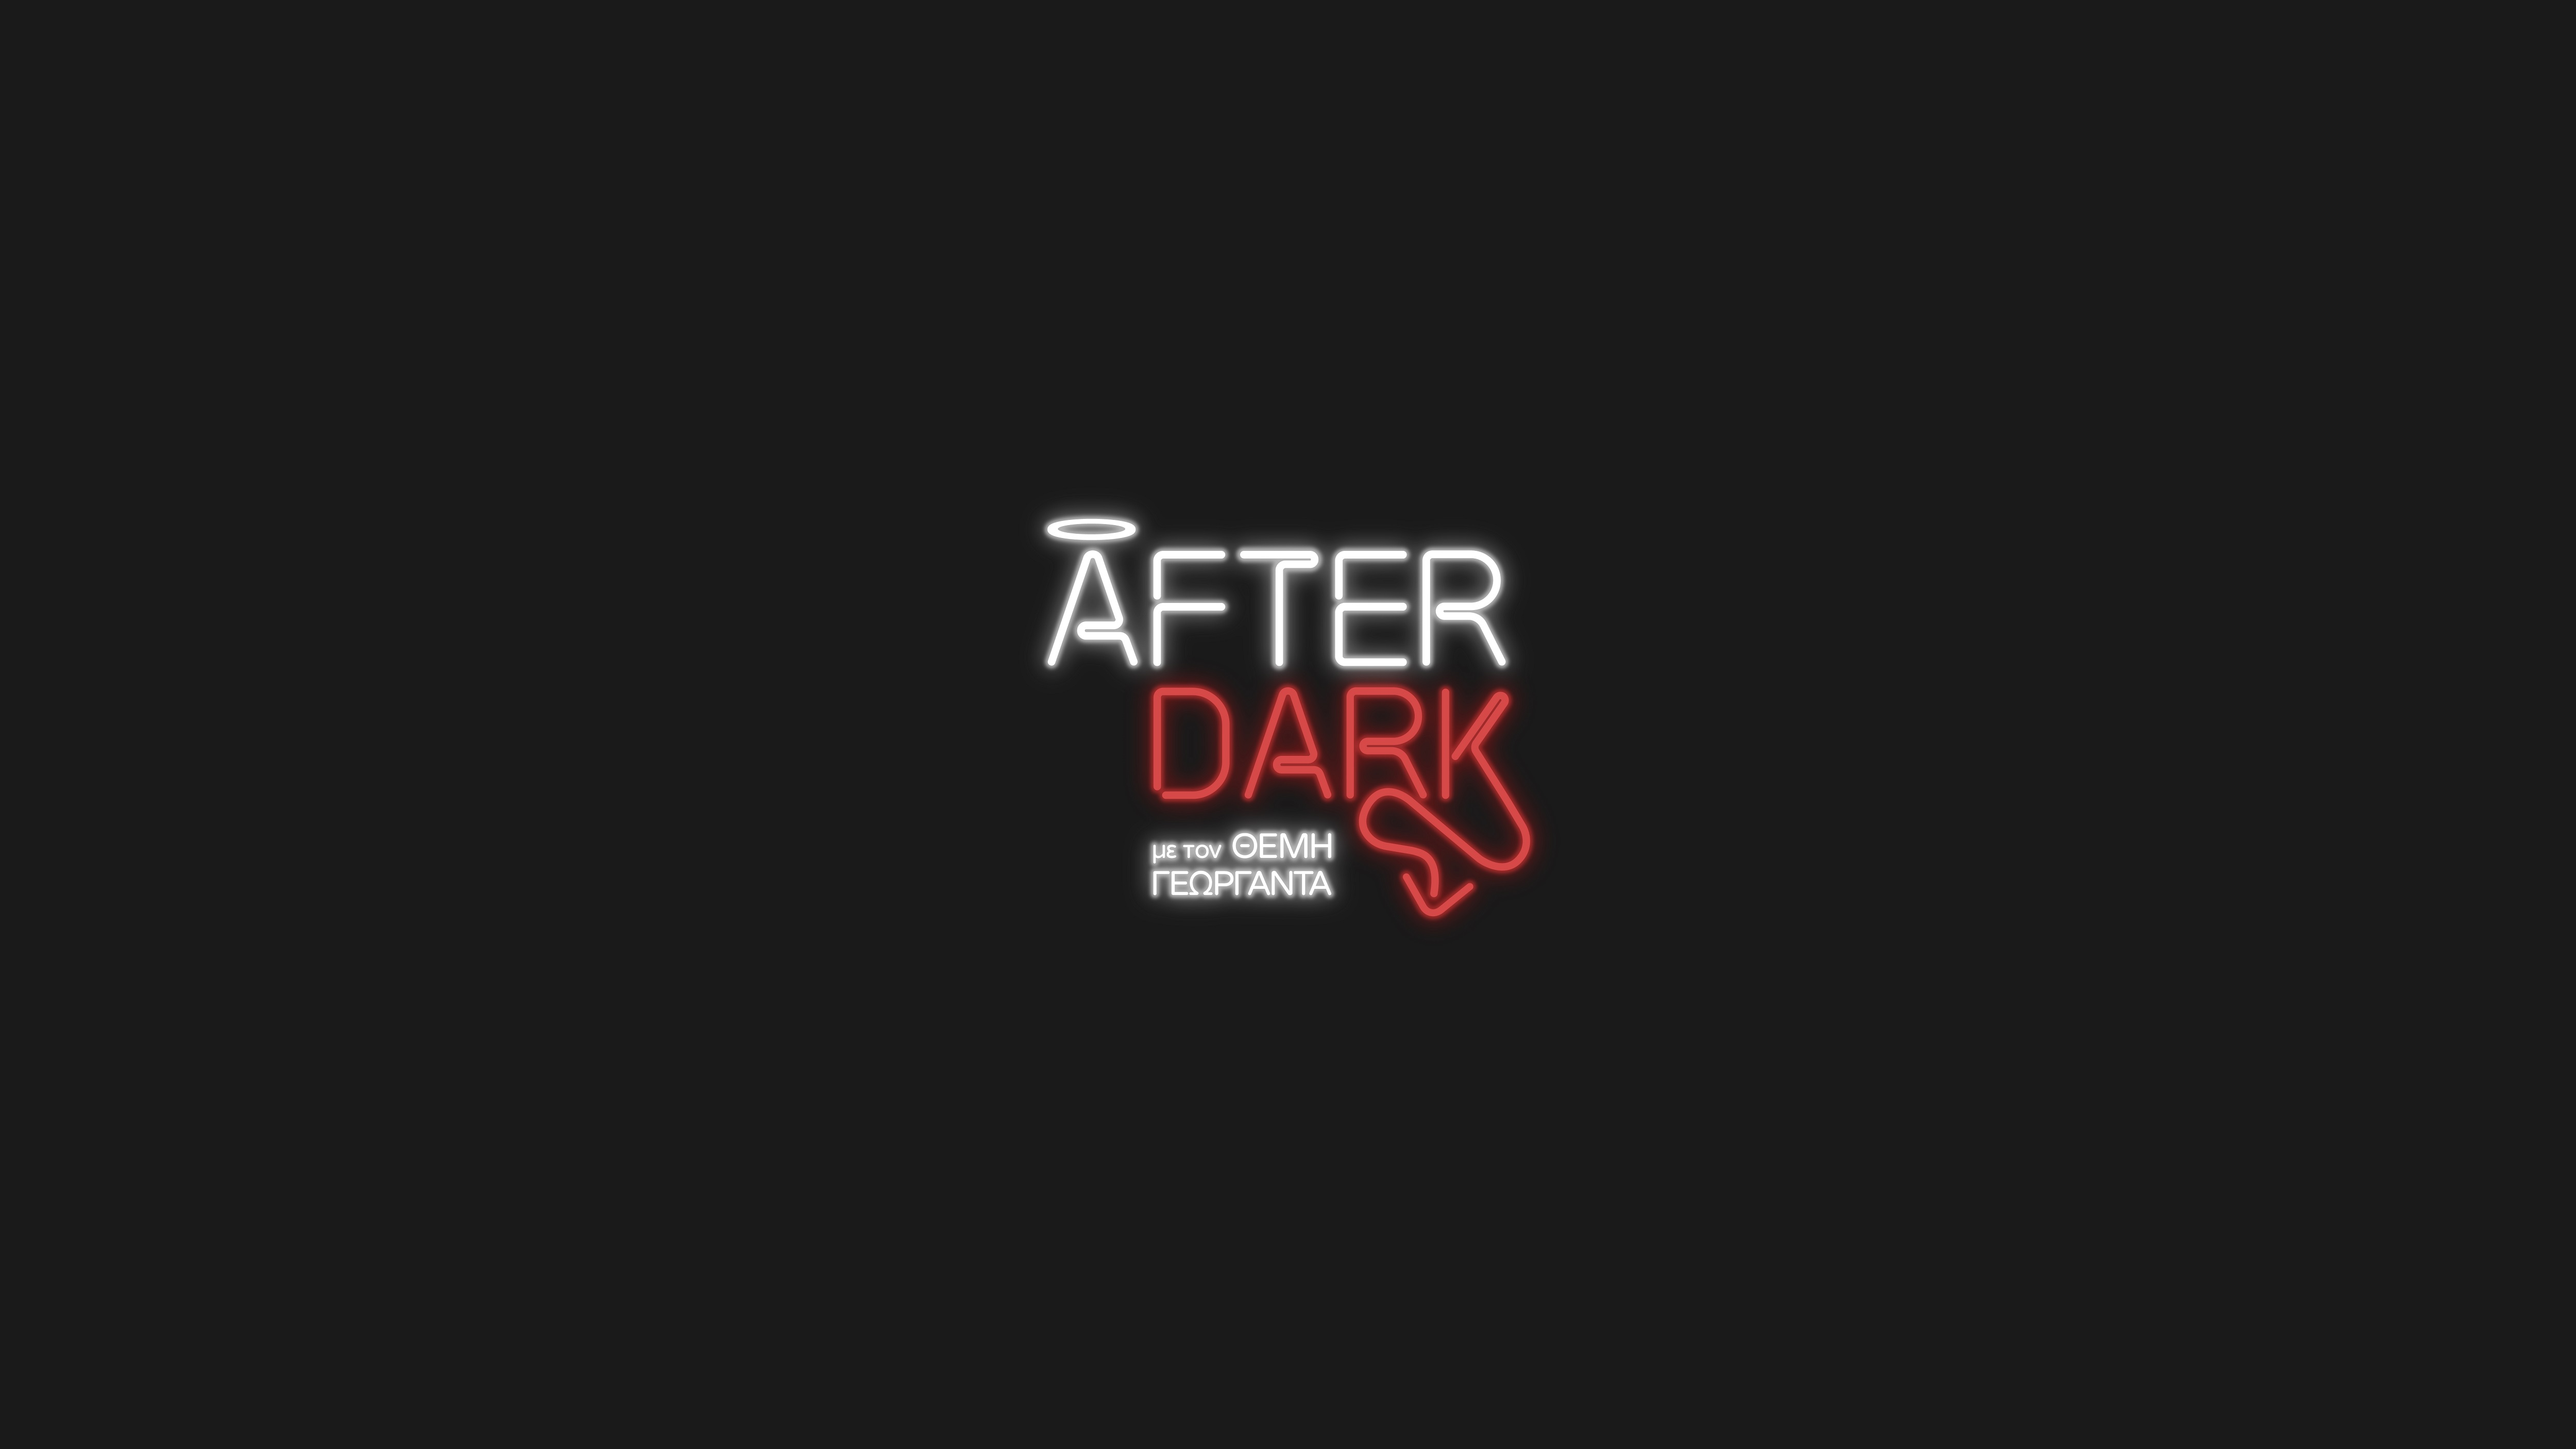 After Dark: Ο Στέλιος Κουδουνάρης και ο Γιώργος Γεροντιδάκης σε πιο… dark εξομολογήσεις!